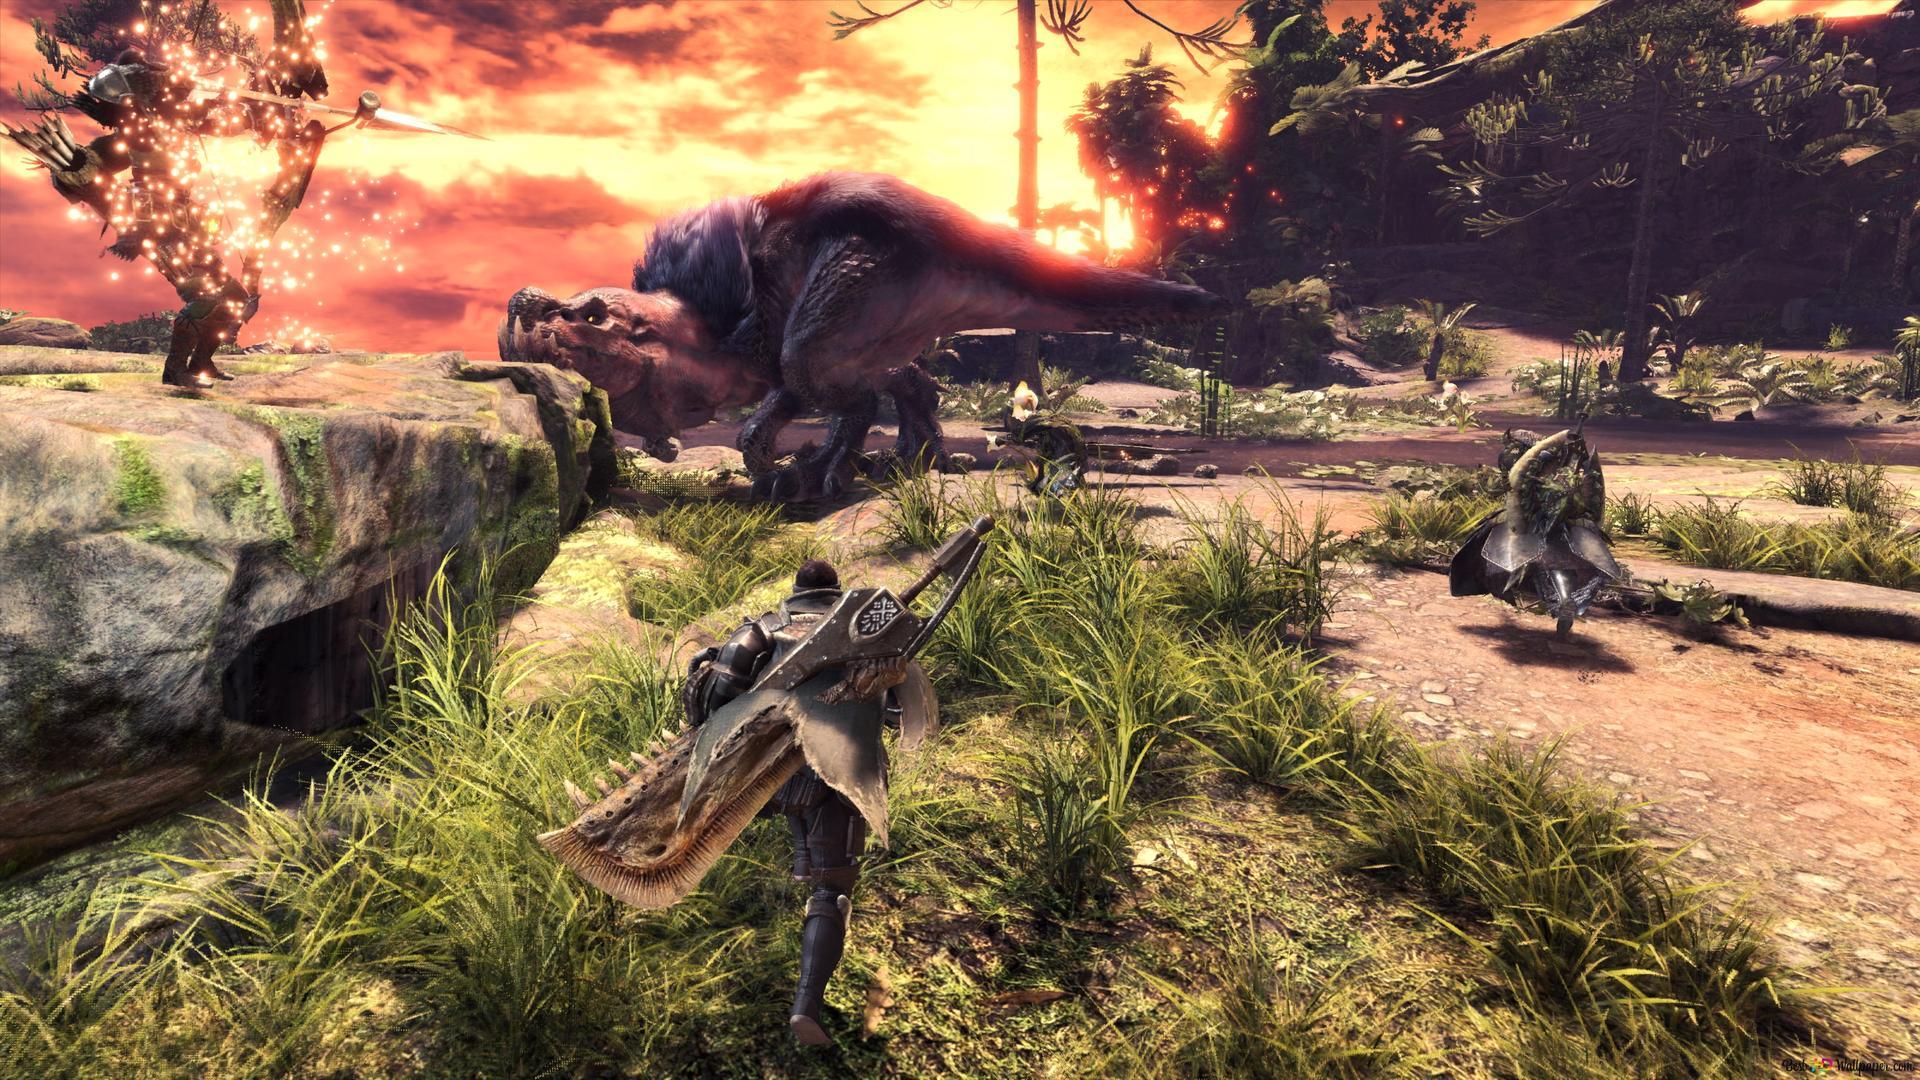 Monster Hunter World Hd Wallpaper Download